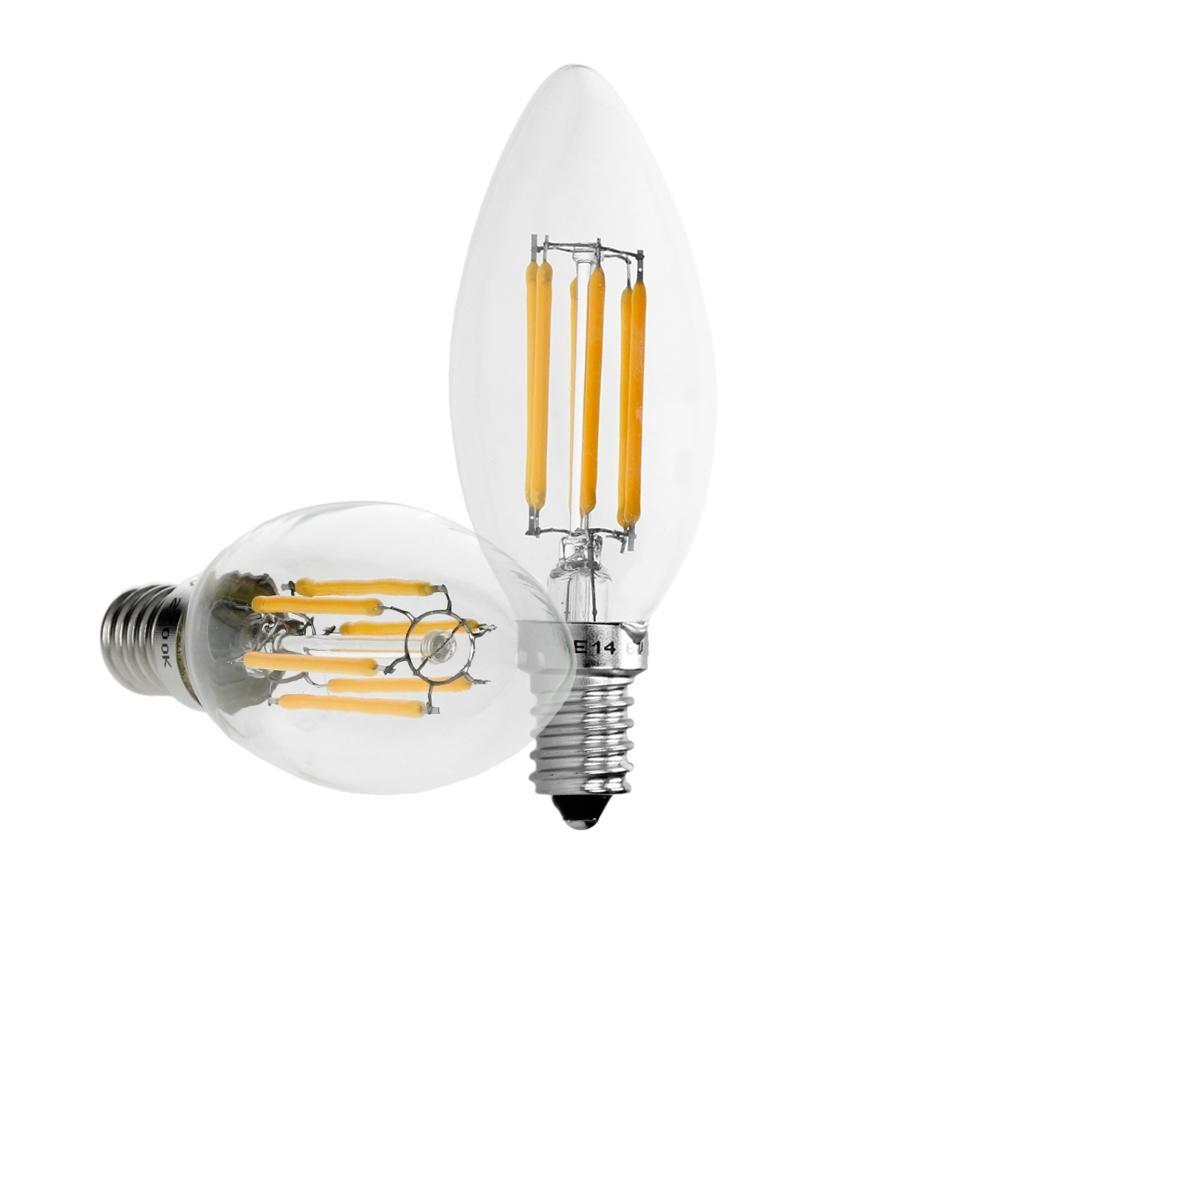 Ecd Germany 20 x lampe LED filament de bougie E14 6W blanc chaud